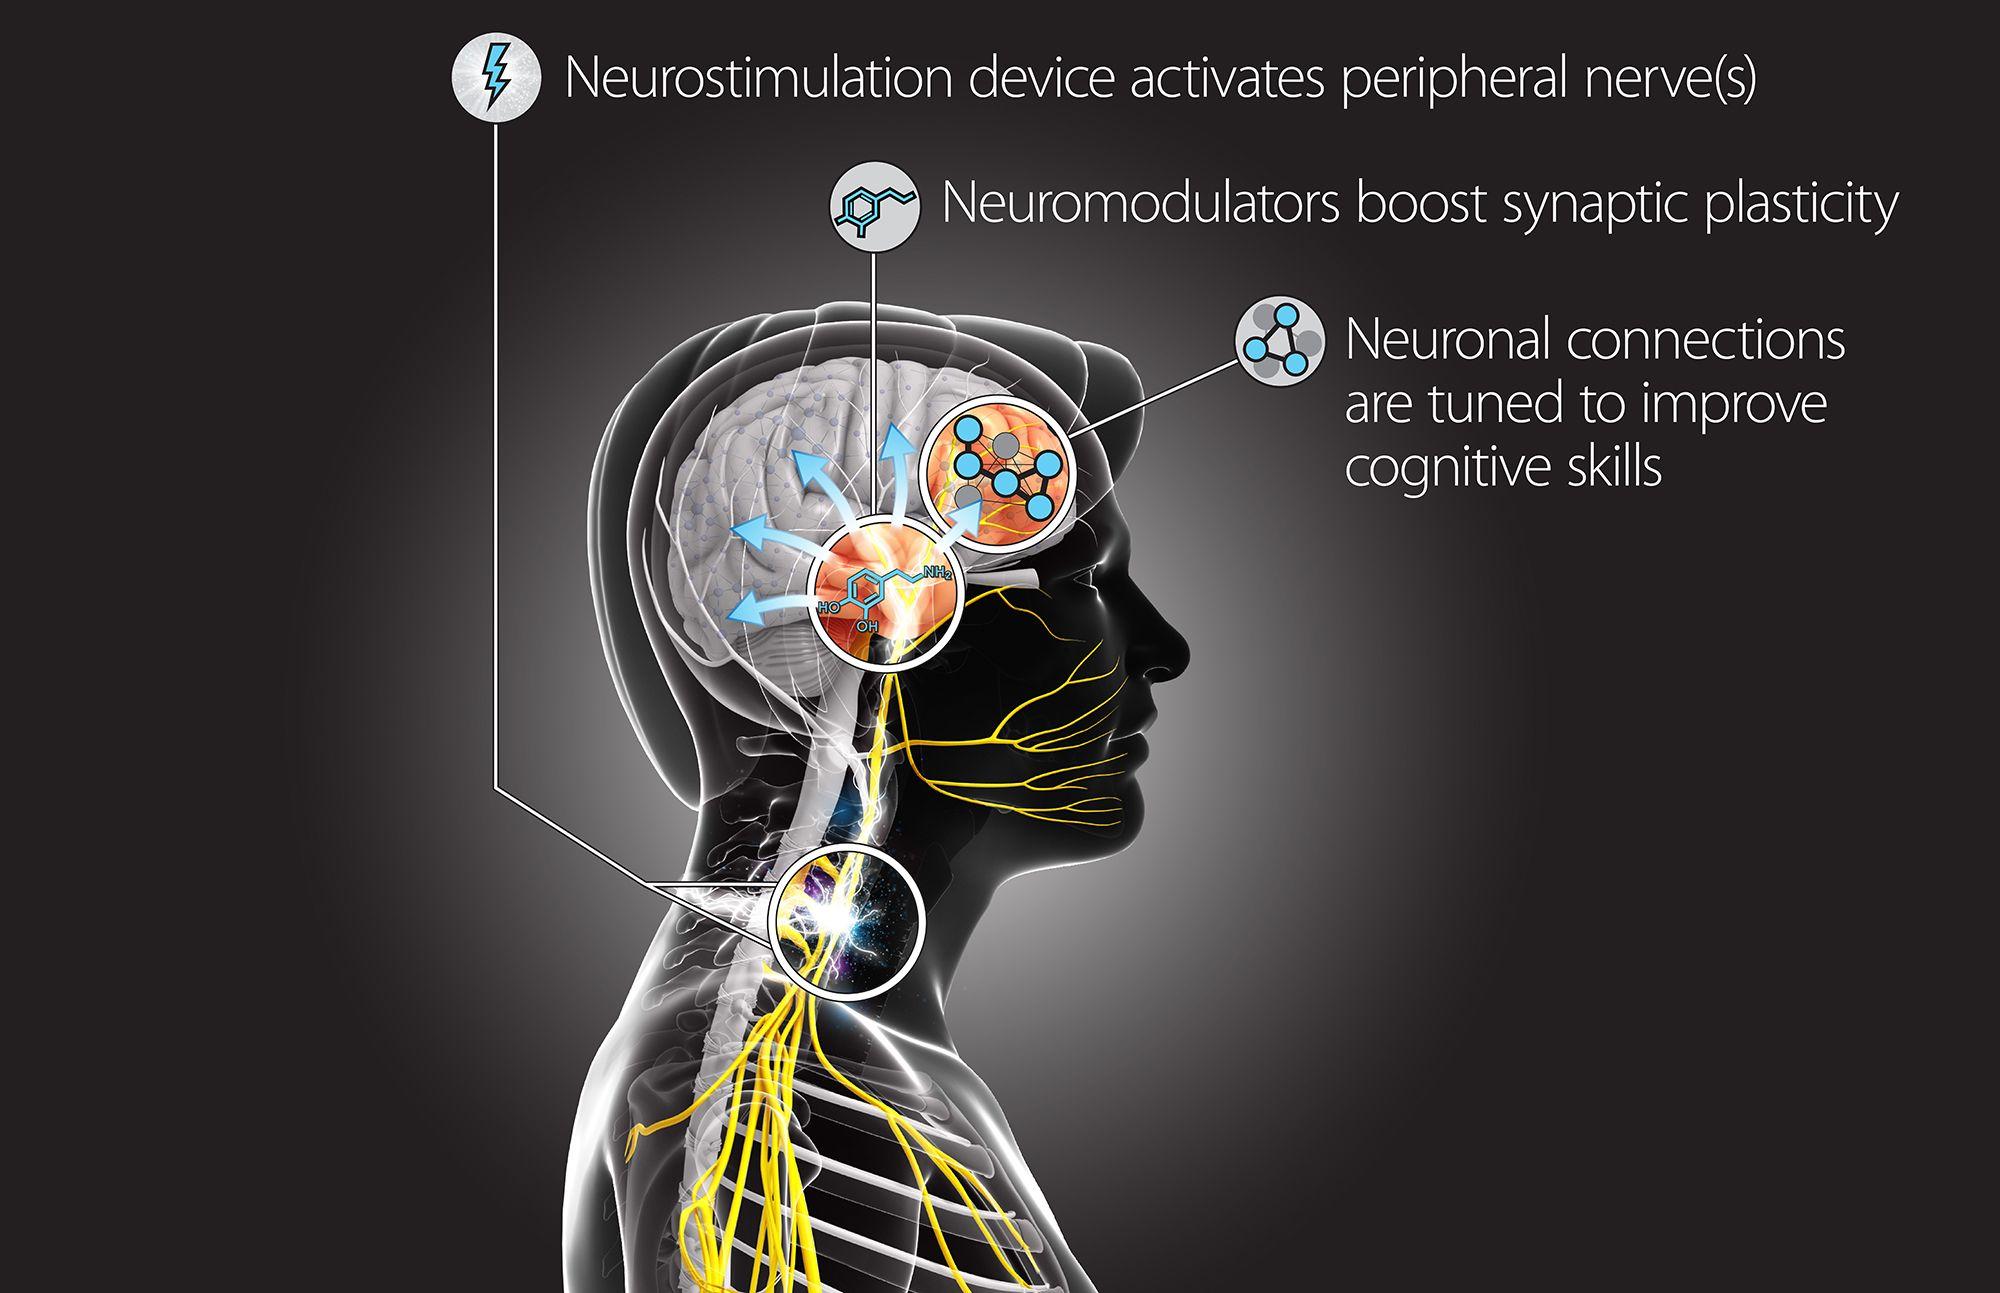 darpa-hack-brain-neurostimulation-device